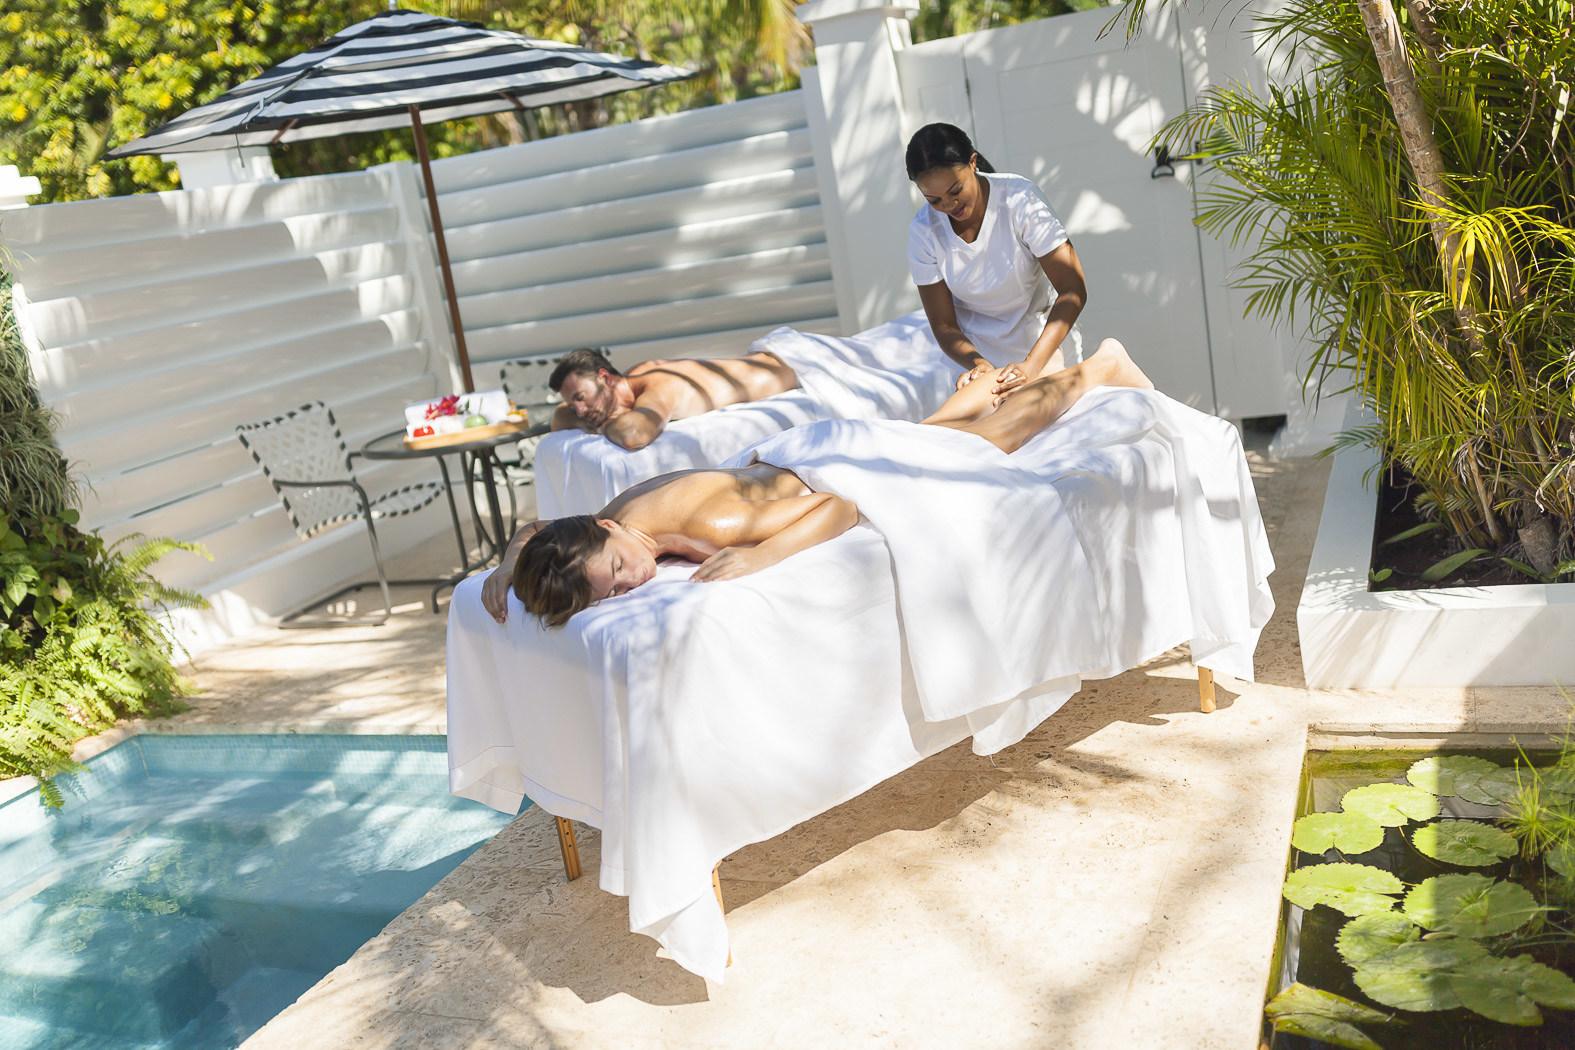 Couples Resorts Jamaica Offers New CBD Oil Massage